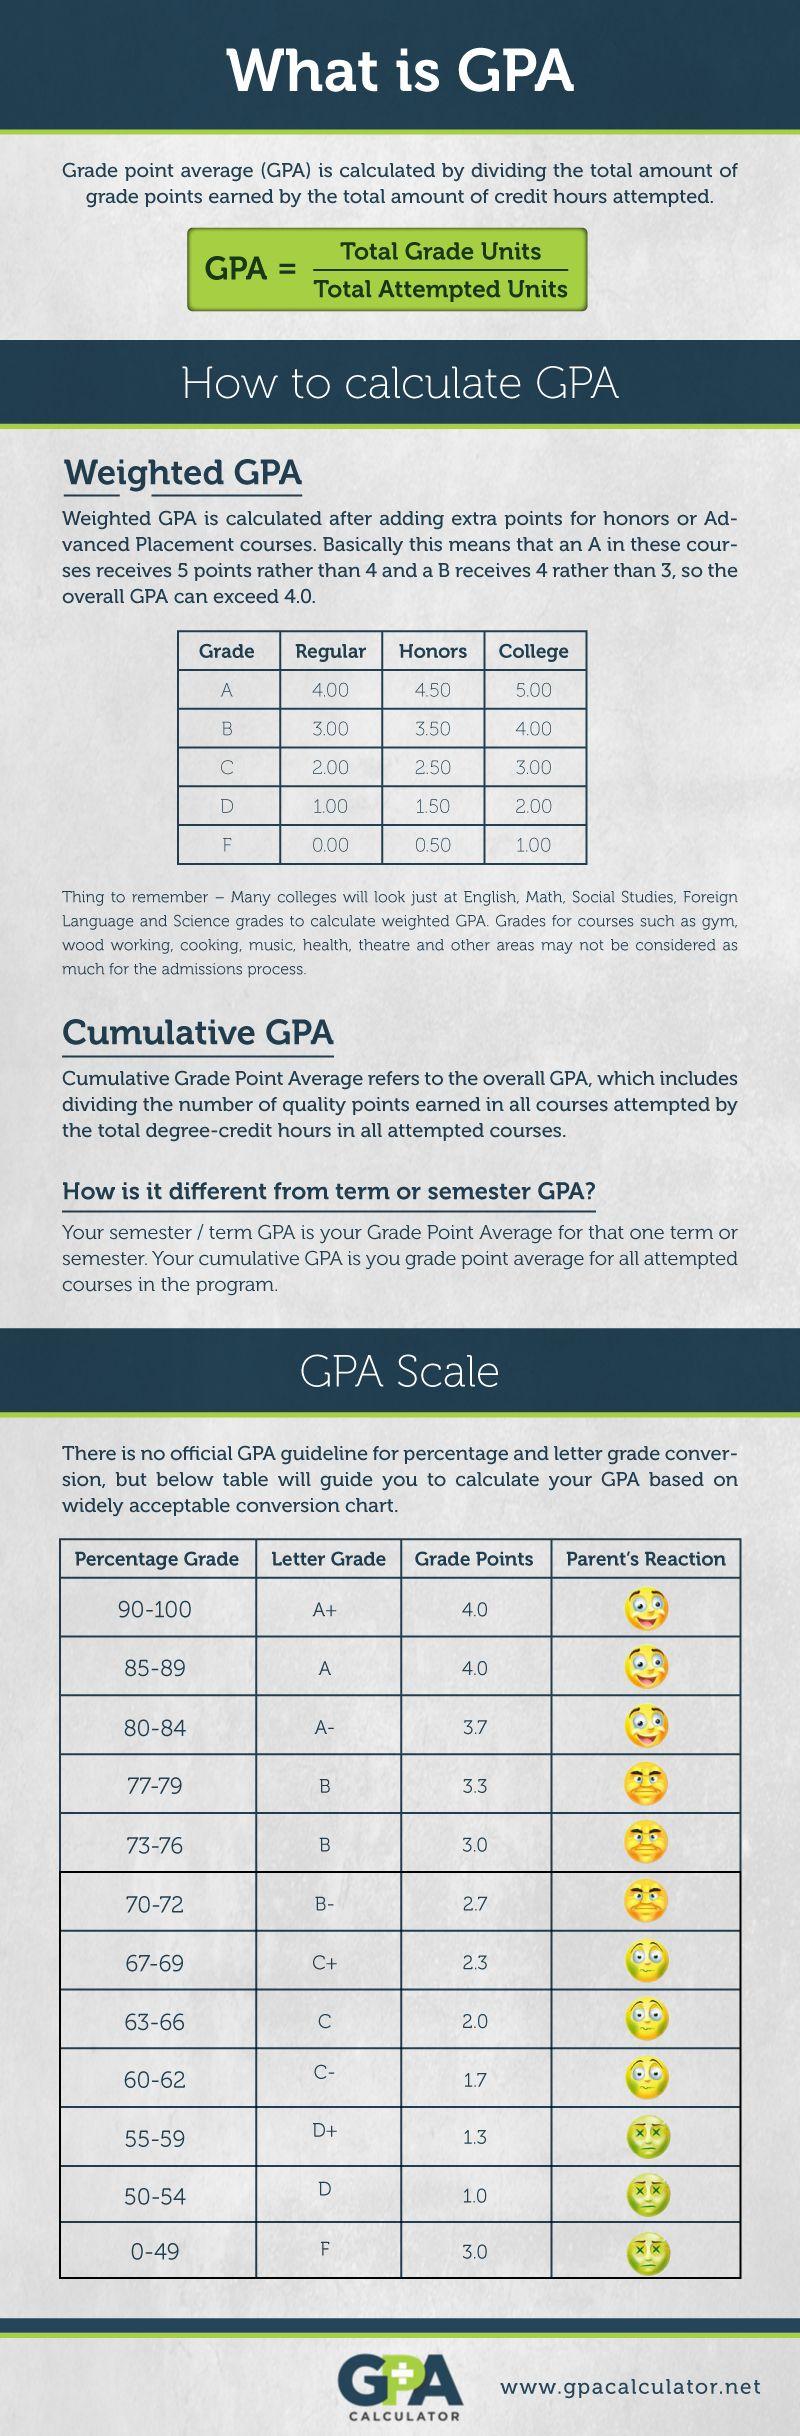 GPA Infographic Gpa, Infographic, Class meetings